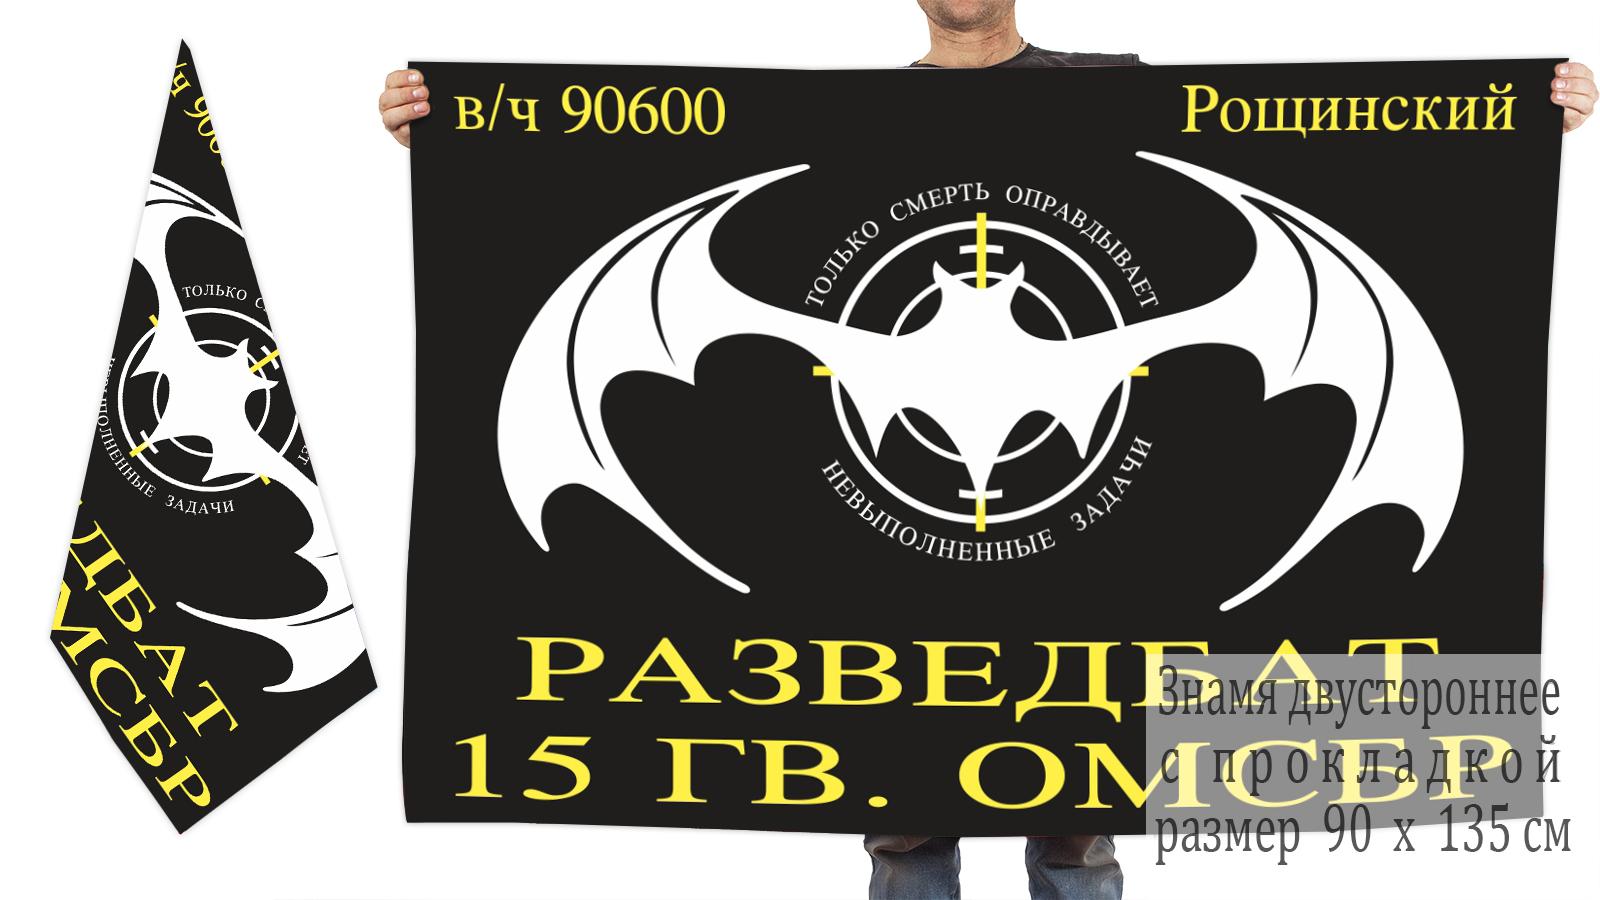 Двухсторонний флаг Разведбат 15-я гв. ОМСБр, в/ч 90600 Рощинский